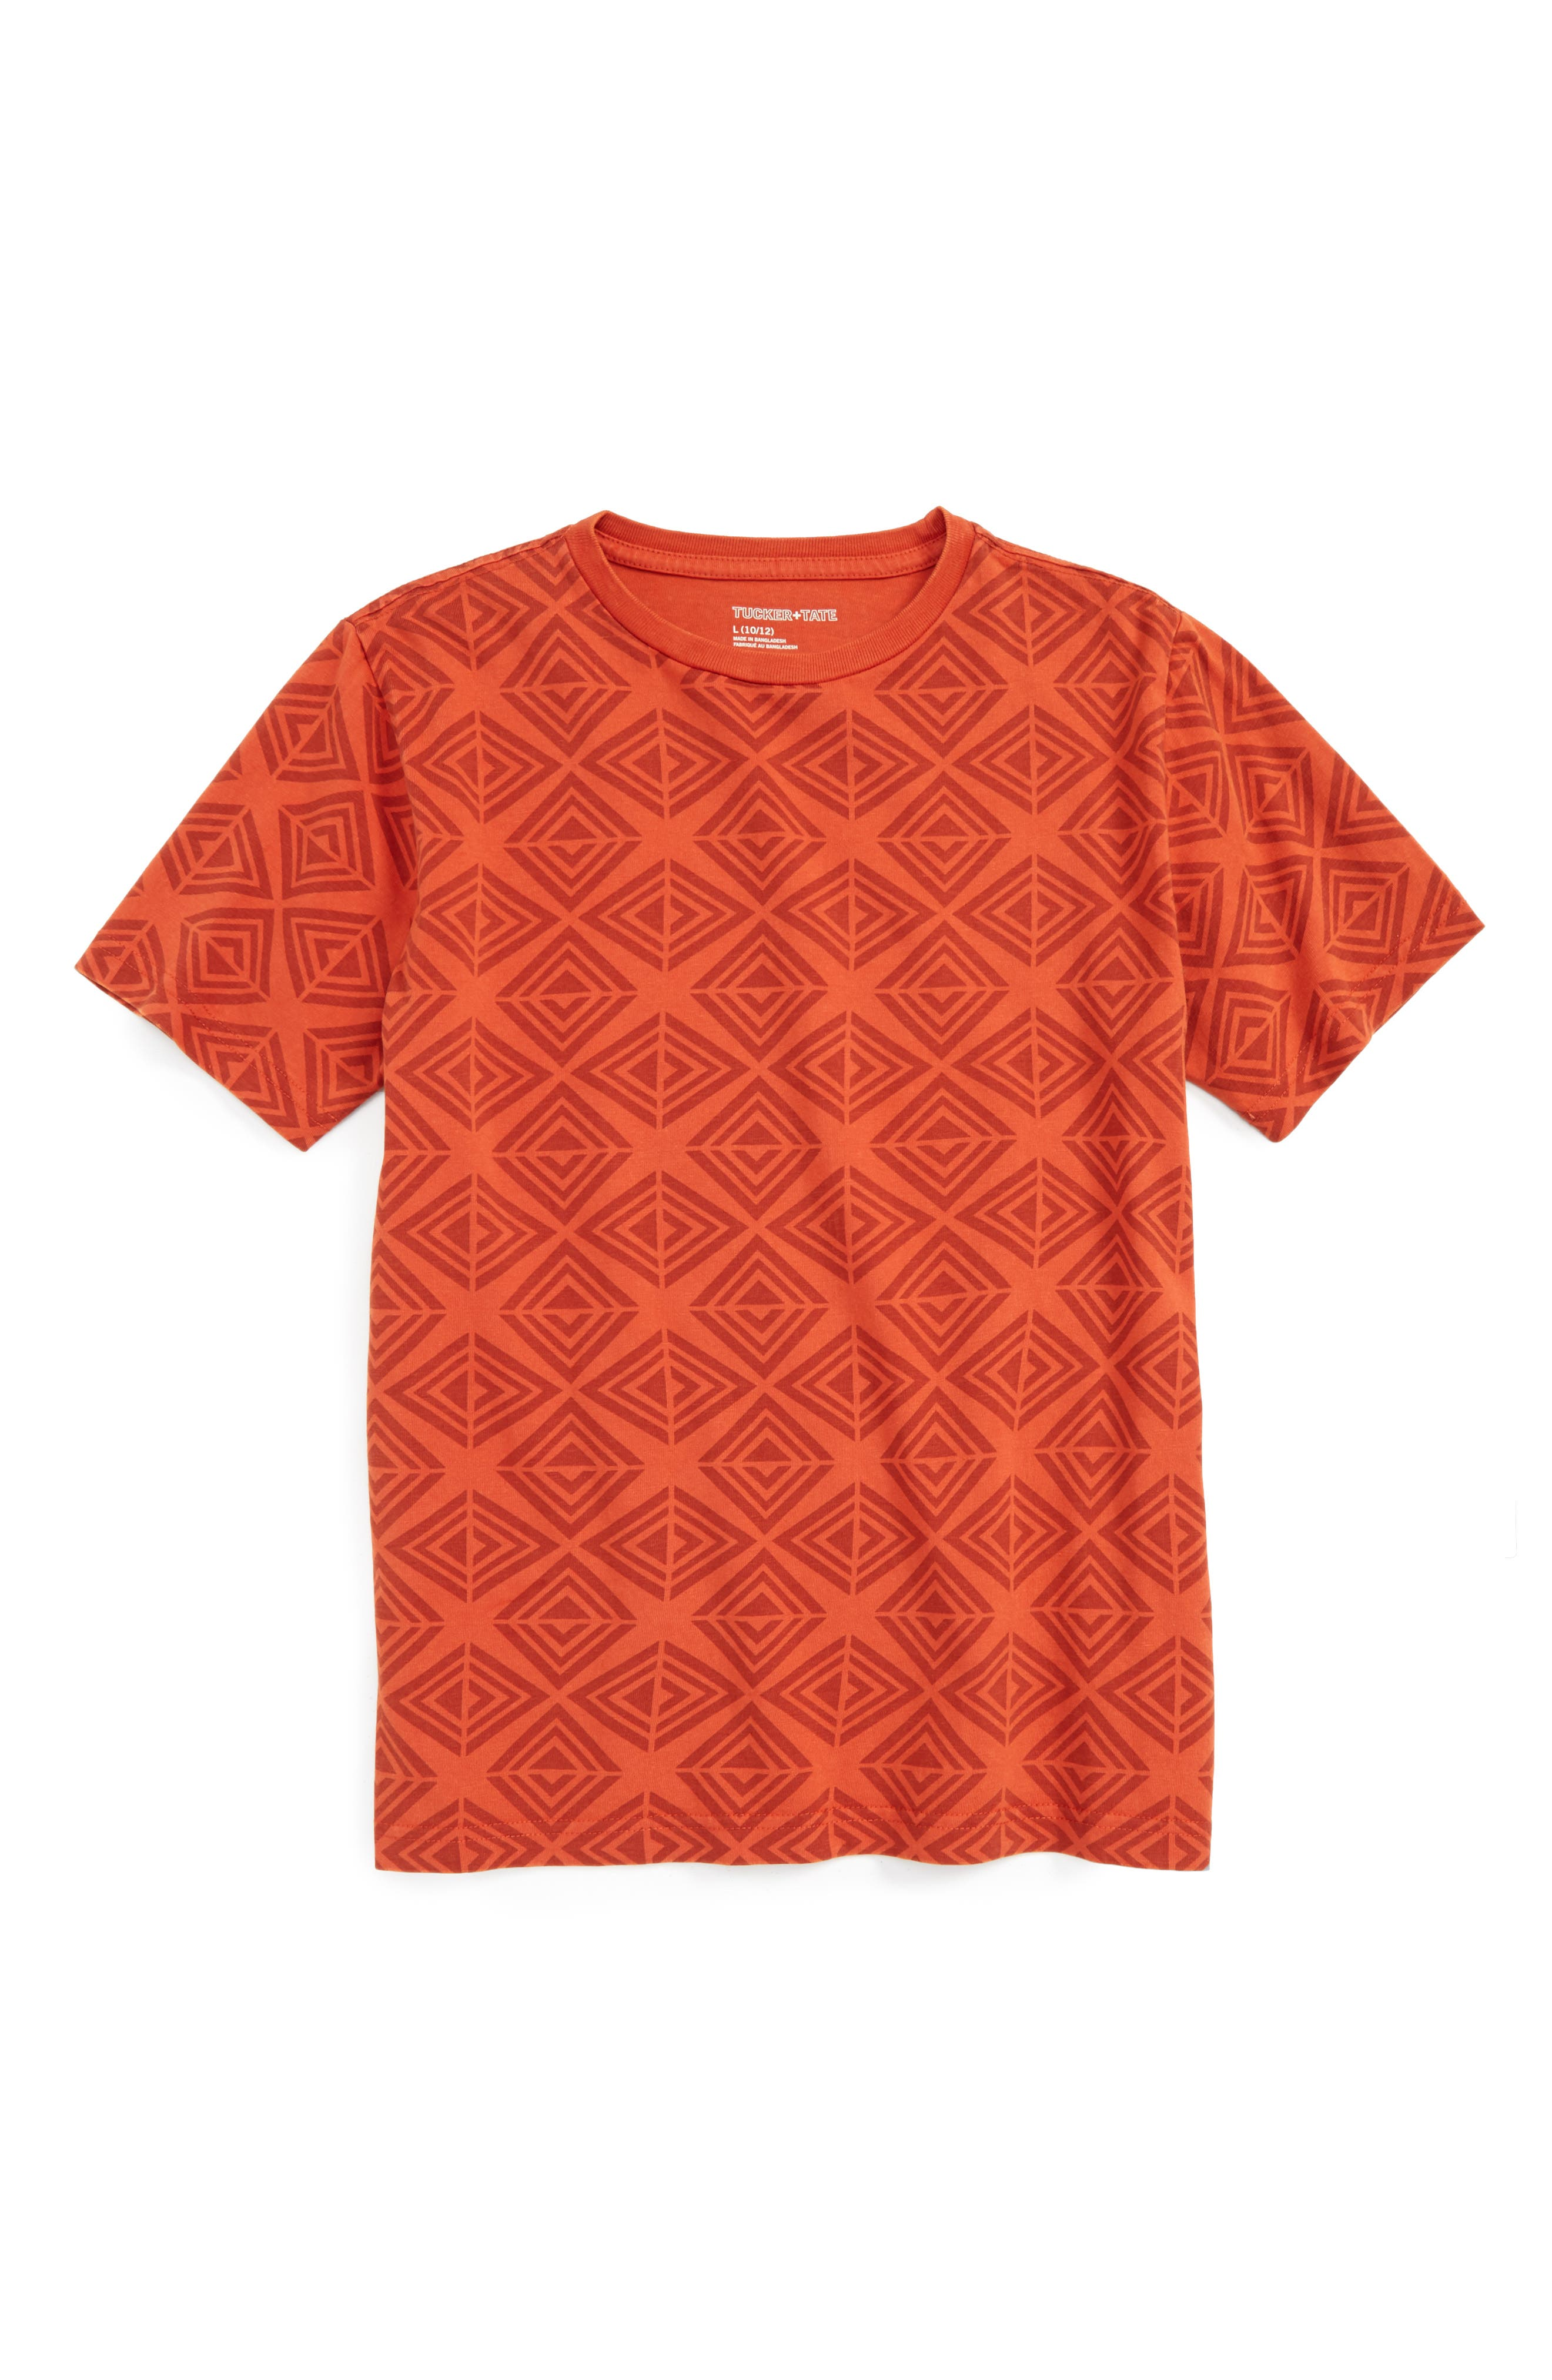 Alternate Image 1 Selected - Tucker + Tate Geometric T-Shirt (Big Boys)